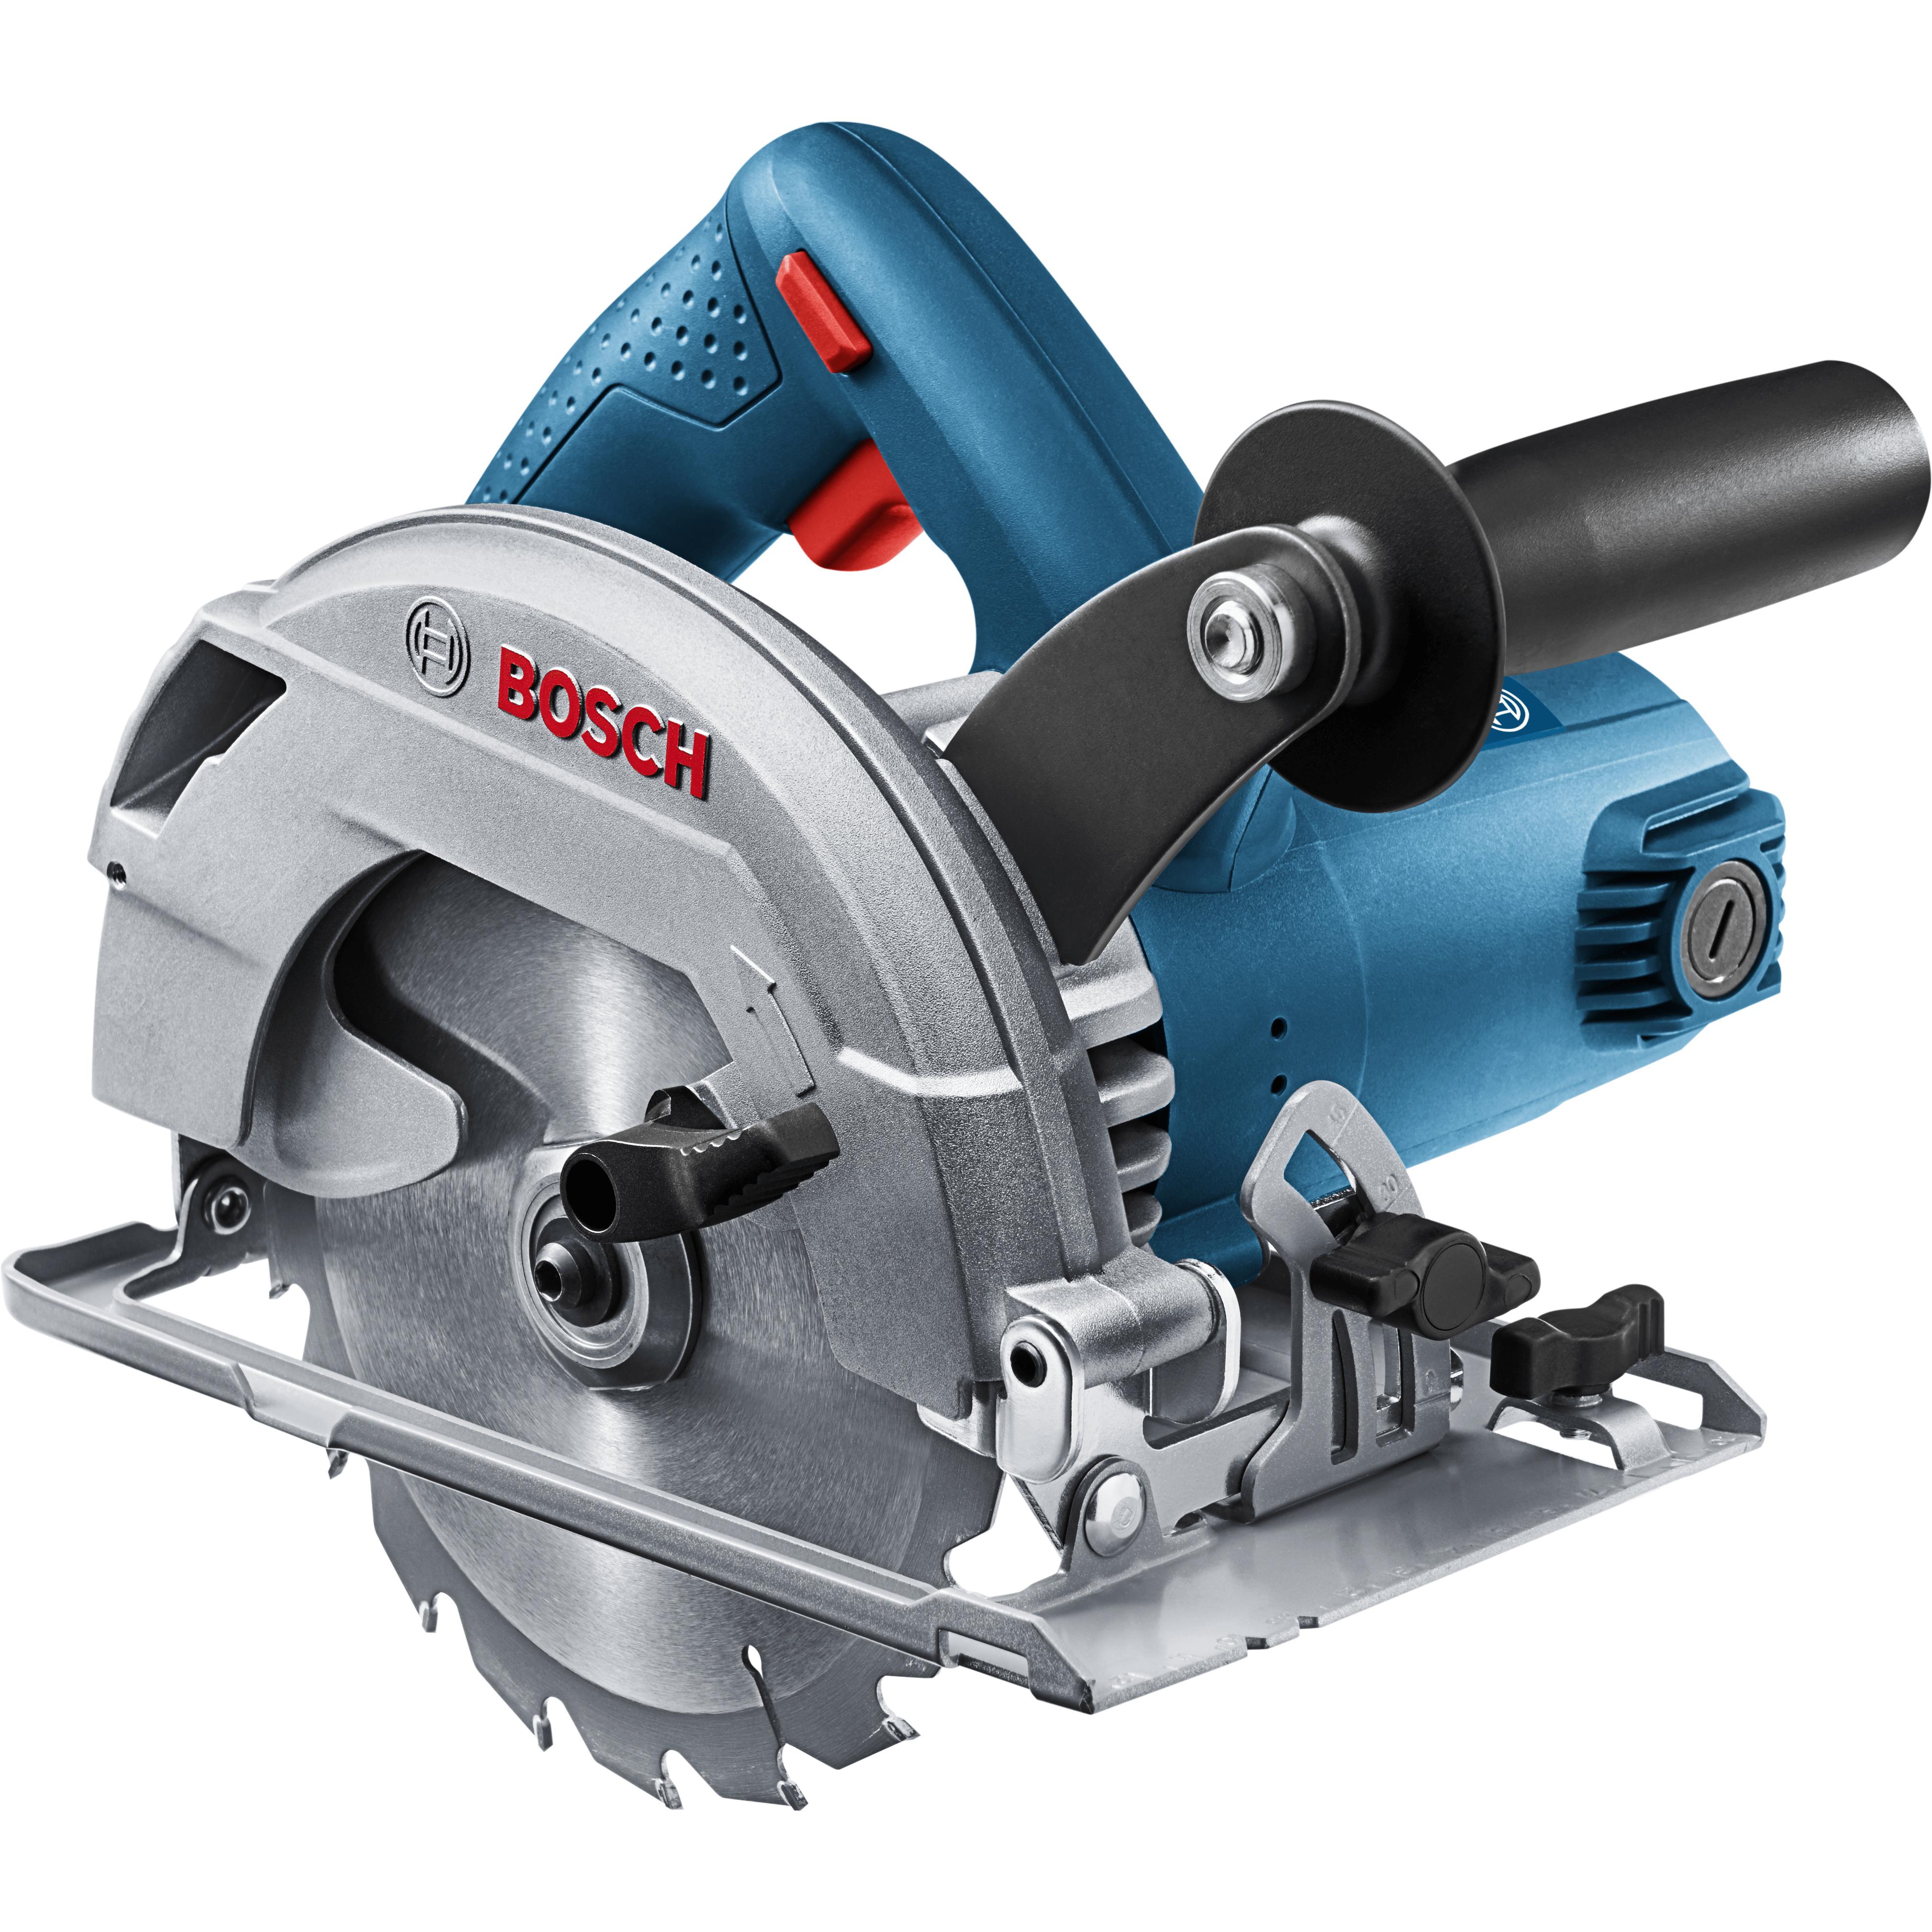 Fierastrau circular Bosch GKS 600 Professional,  1200W, 5200 rpm imagine MatHaus.ro